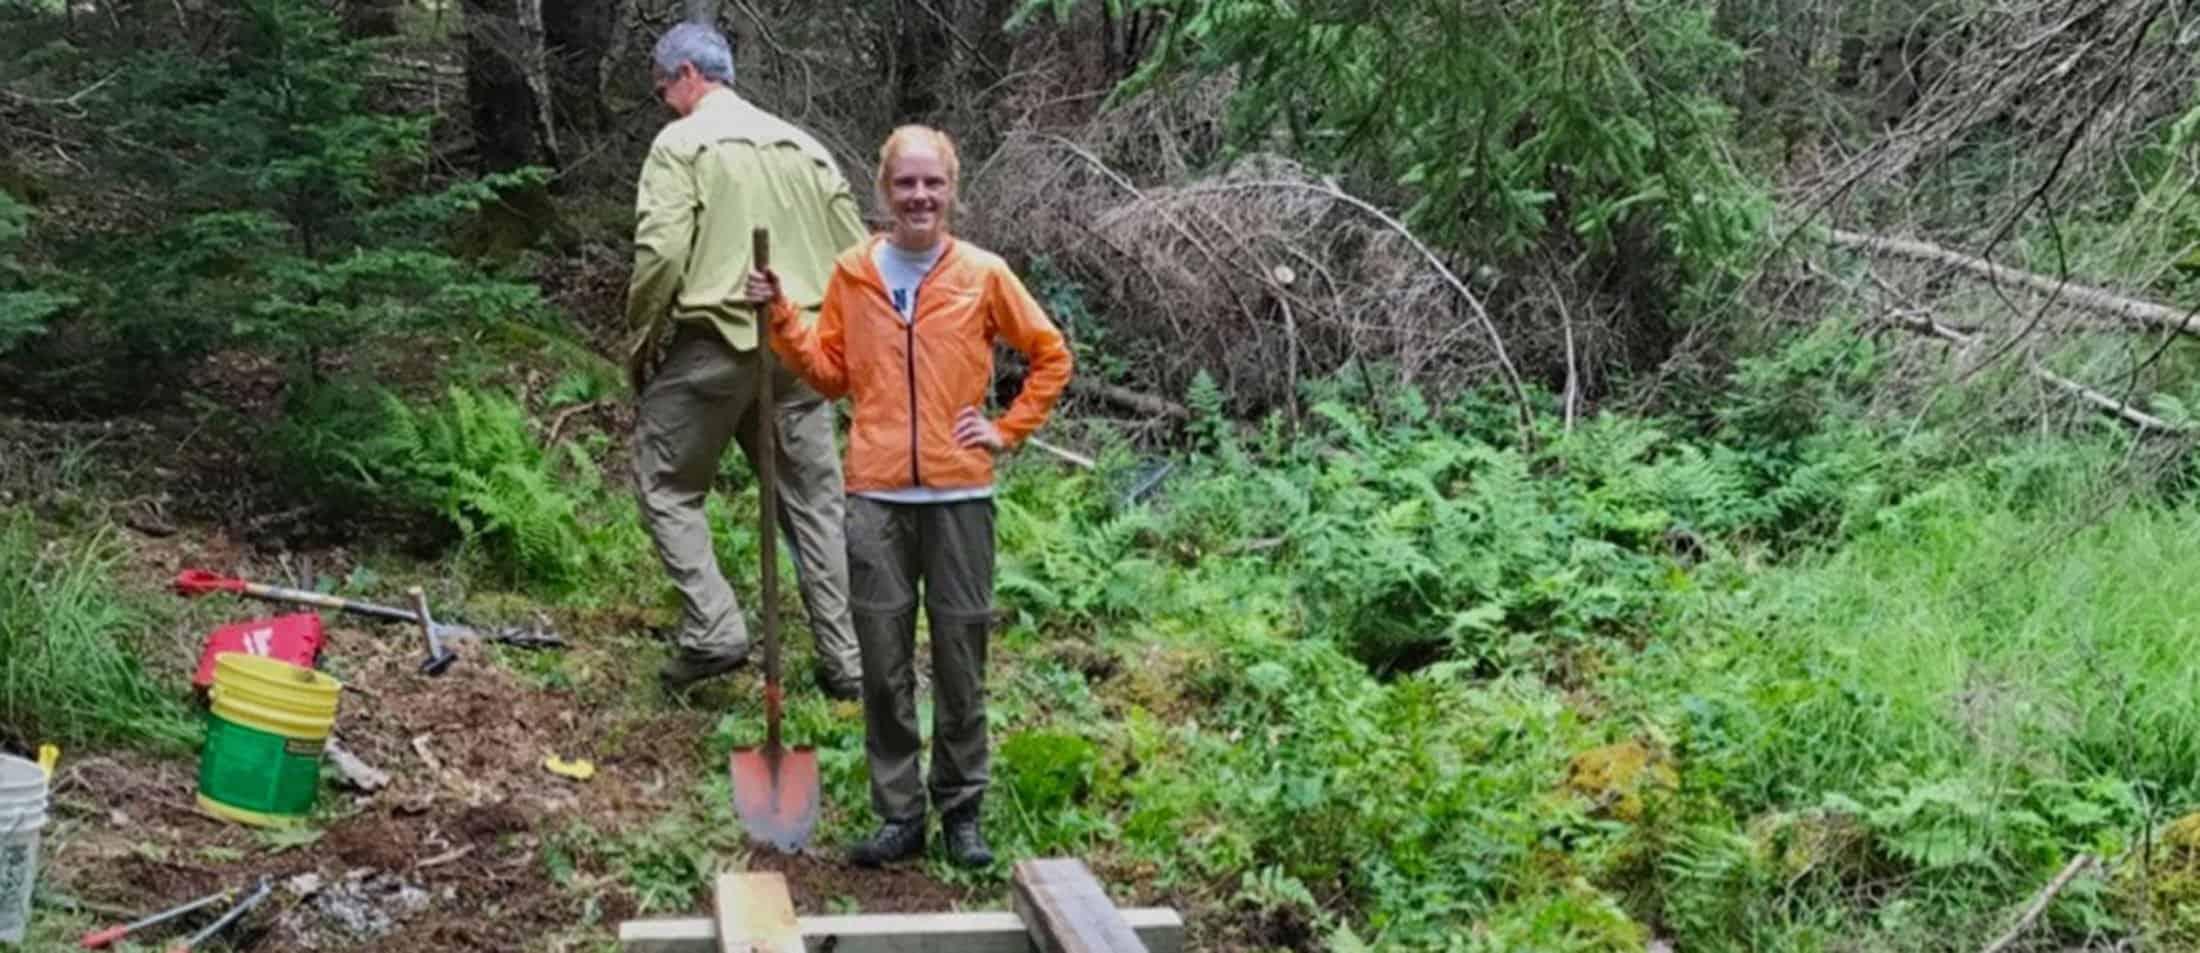 Blue Hill Heritage Trust's Intern helping to build a bridge on John B Mountain's new trail.